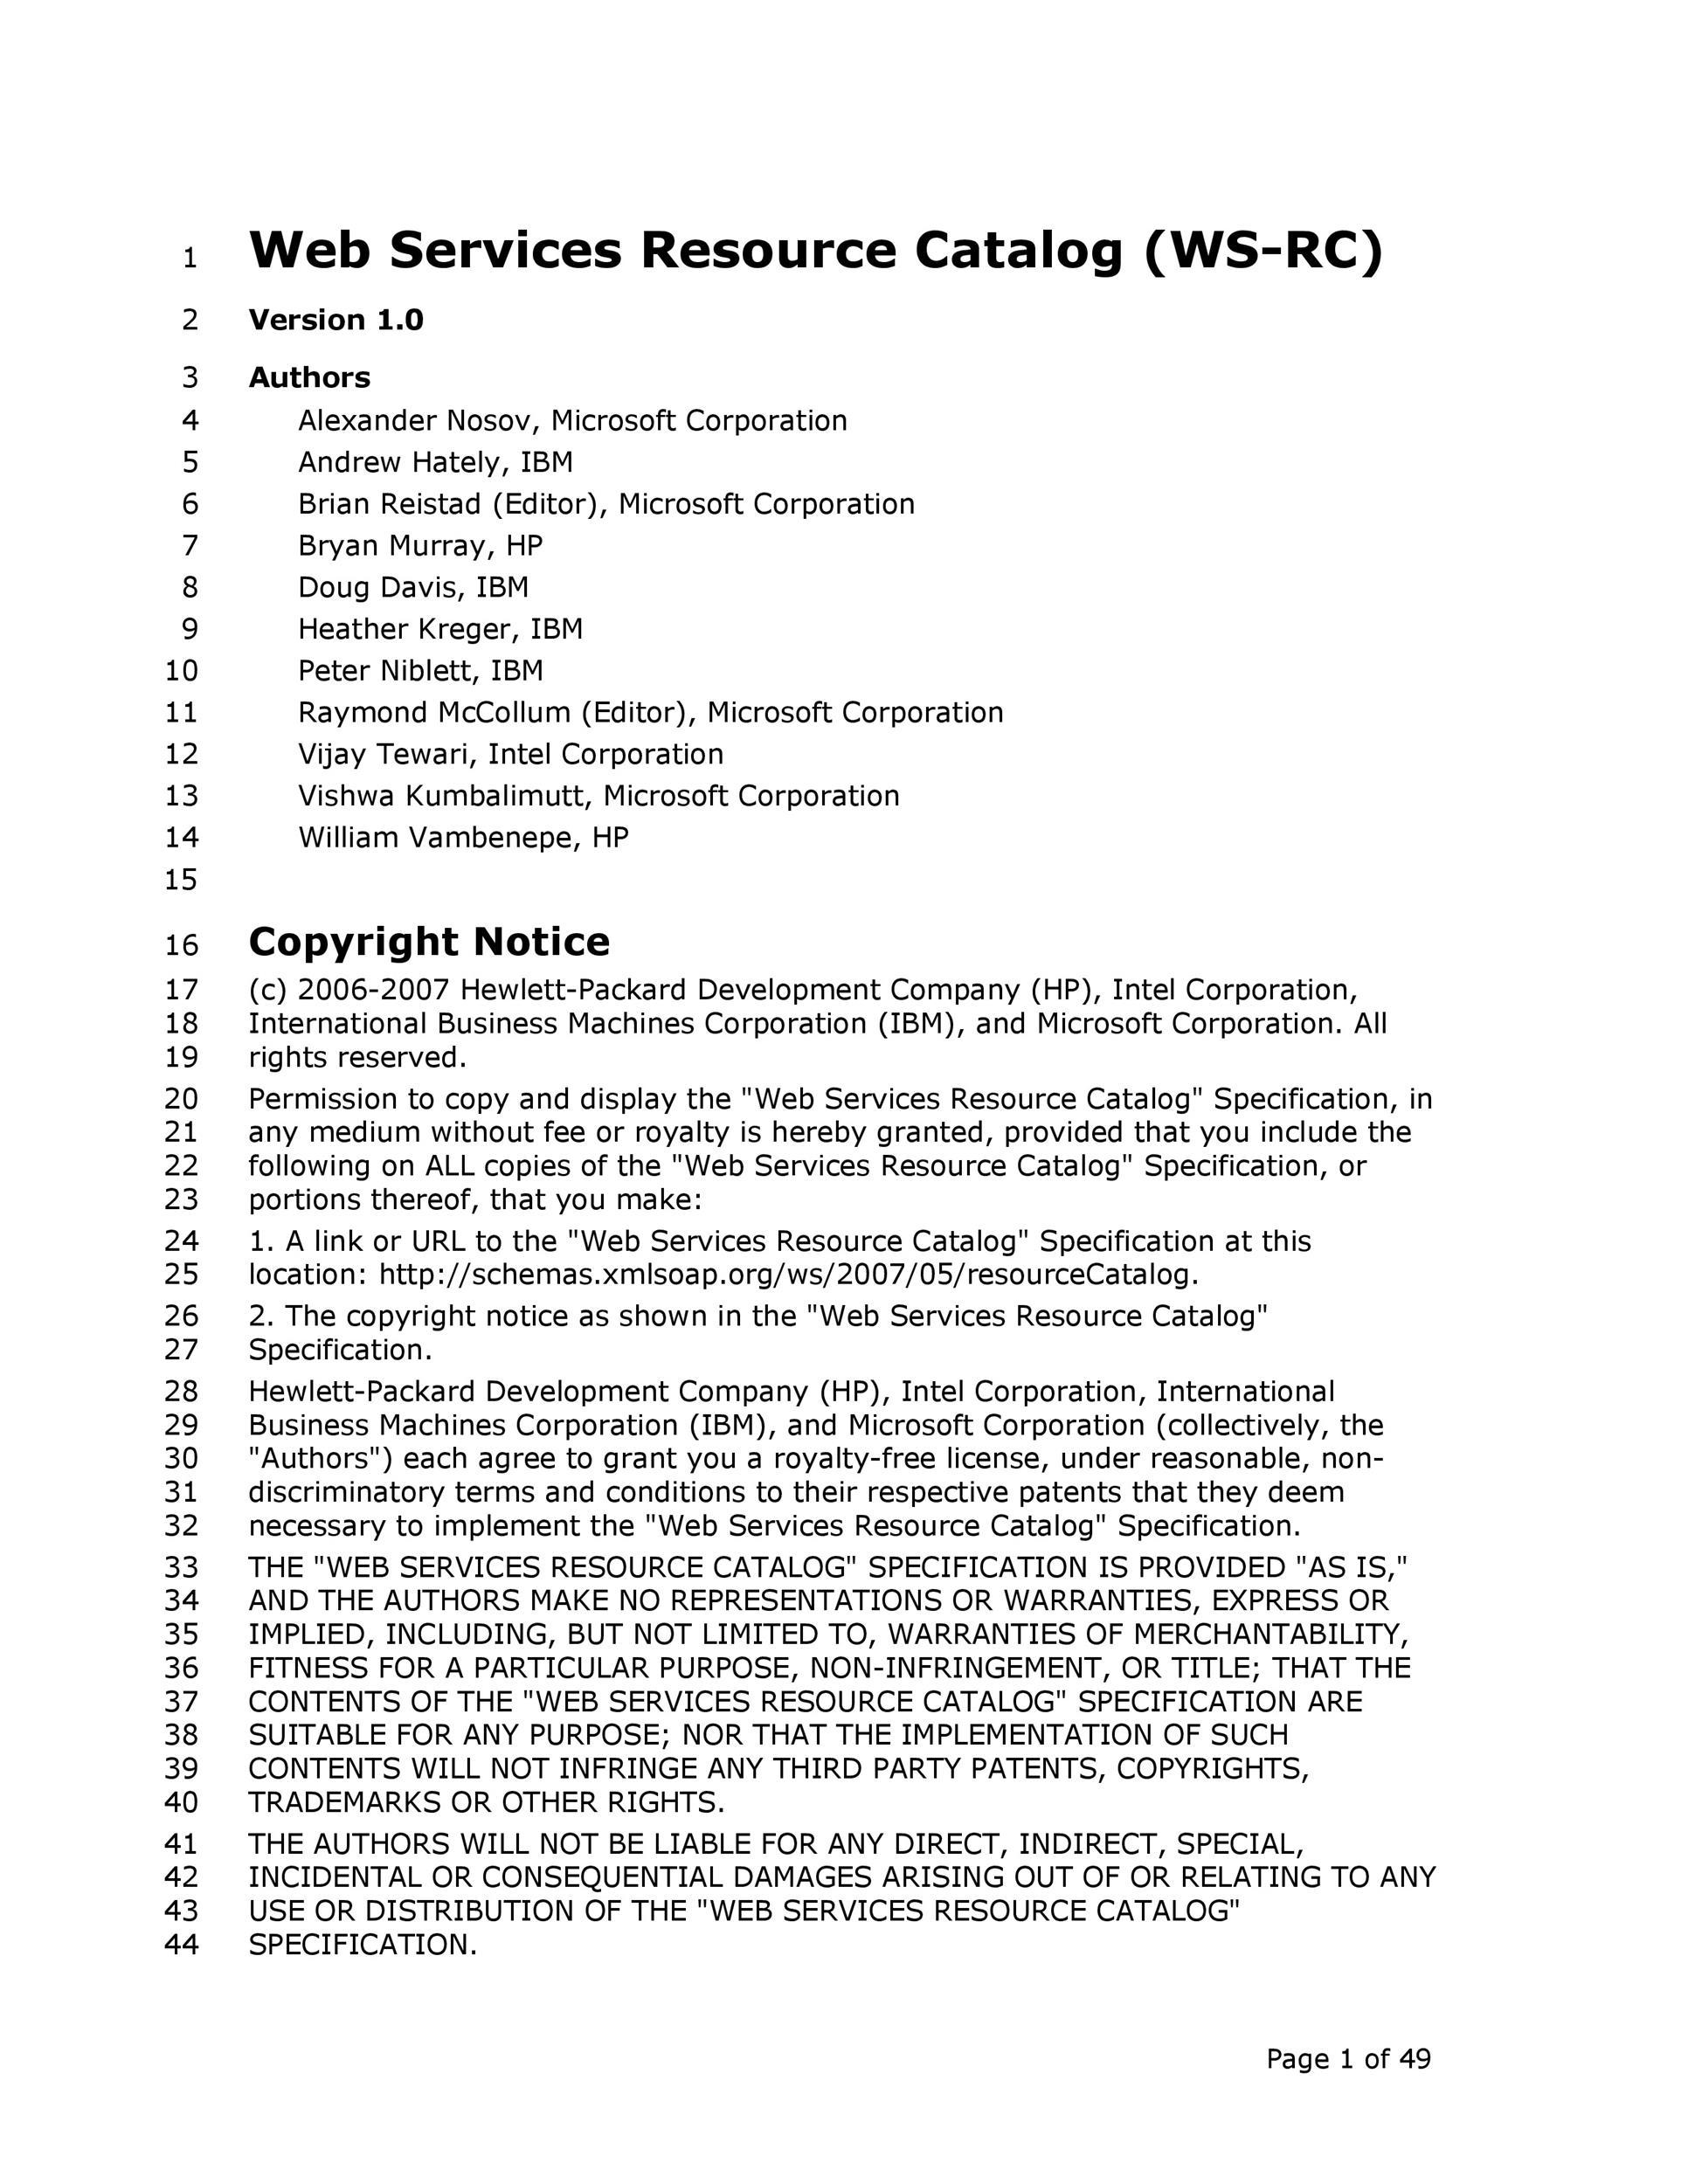 Free catalog template 43